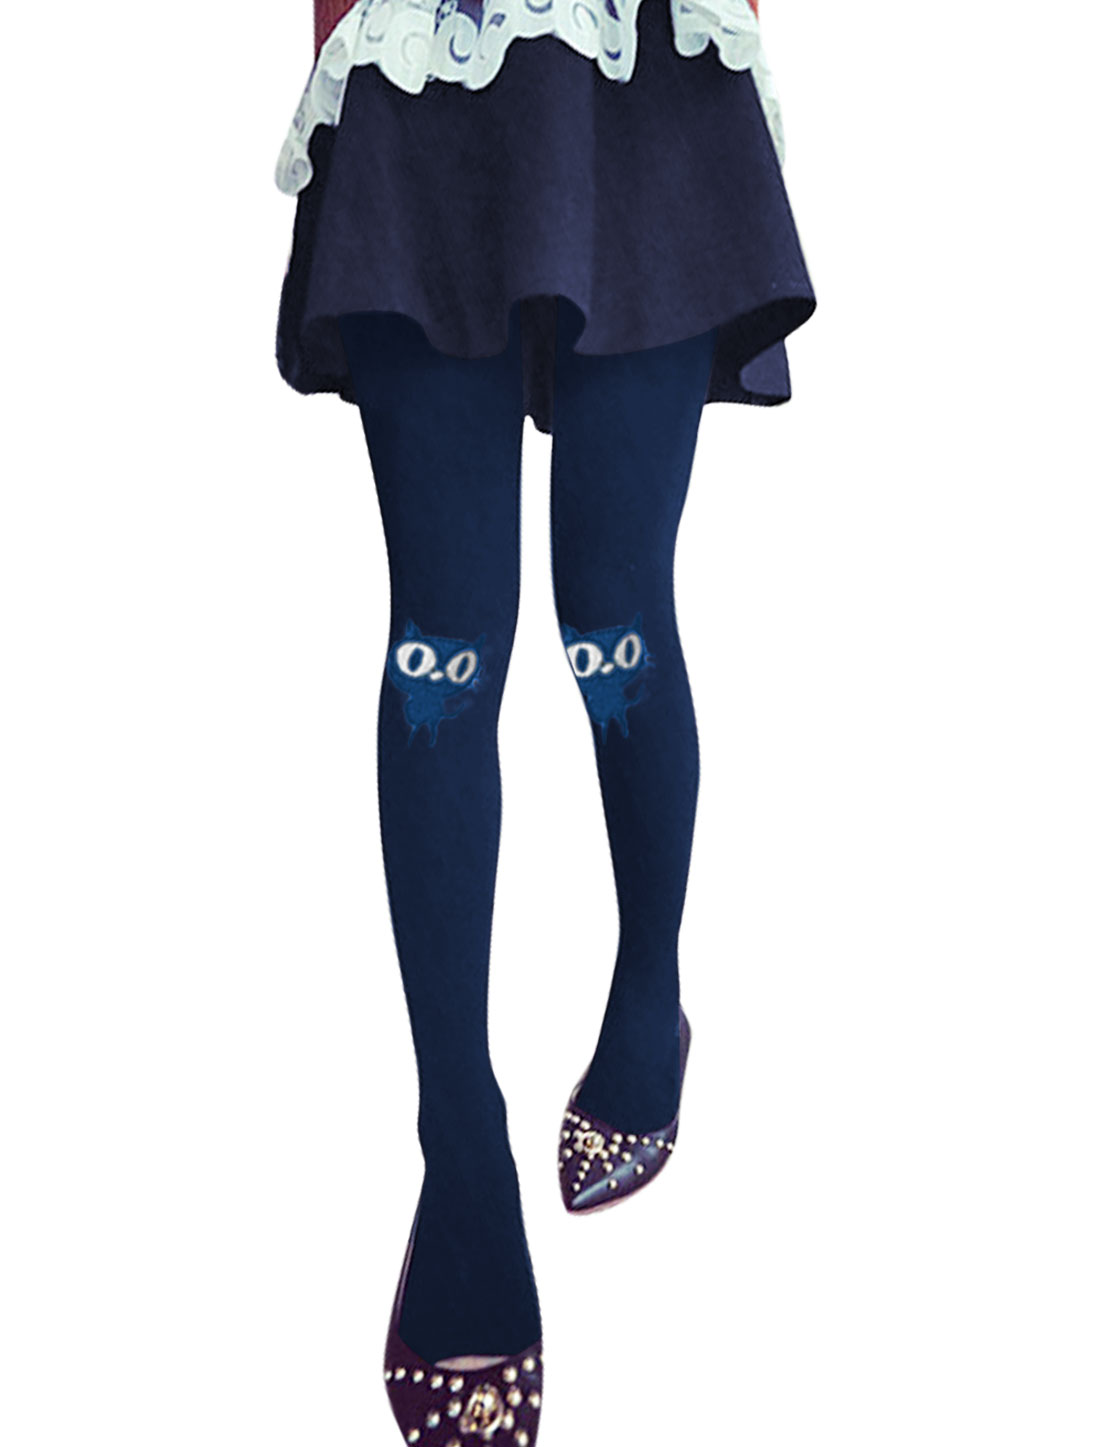 Cats Design Natural Waist NEW Leggings for Women Navy Blue XS